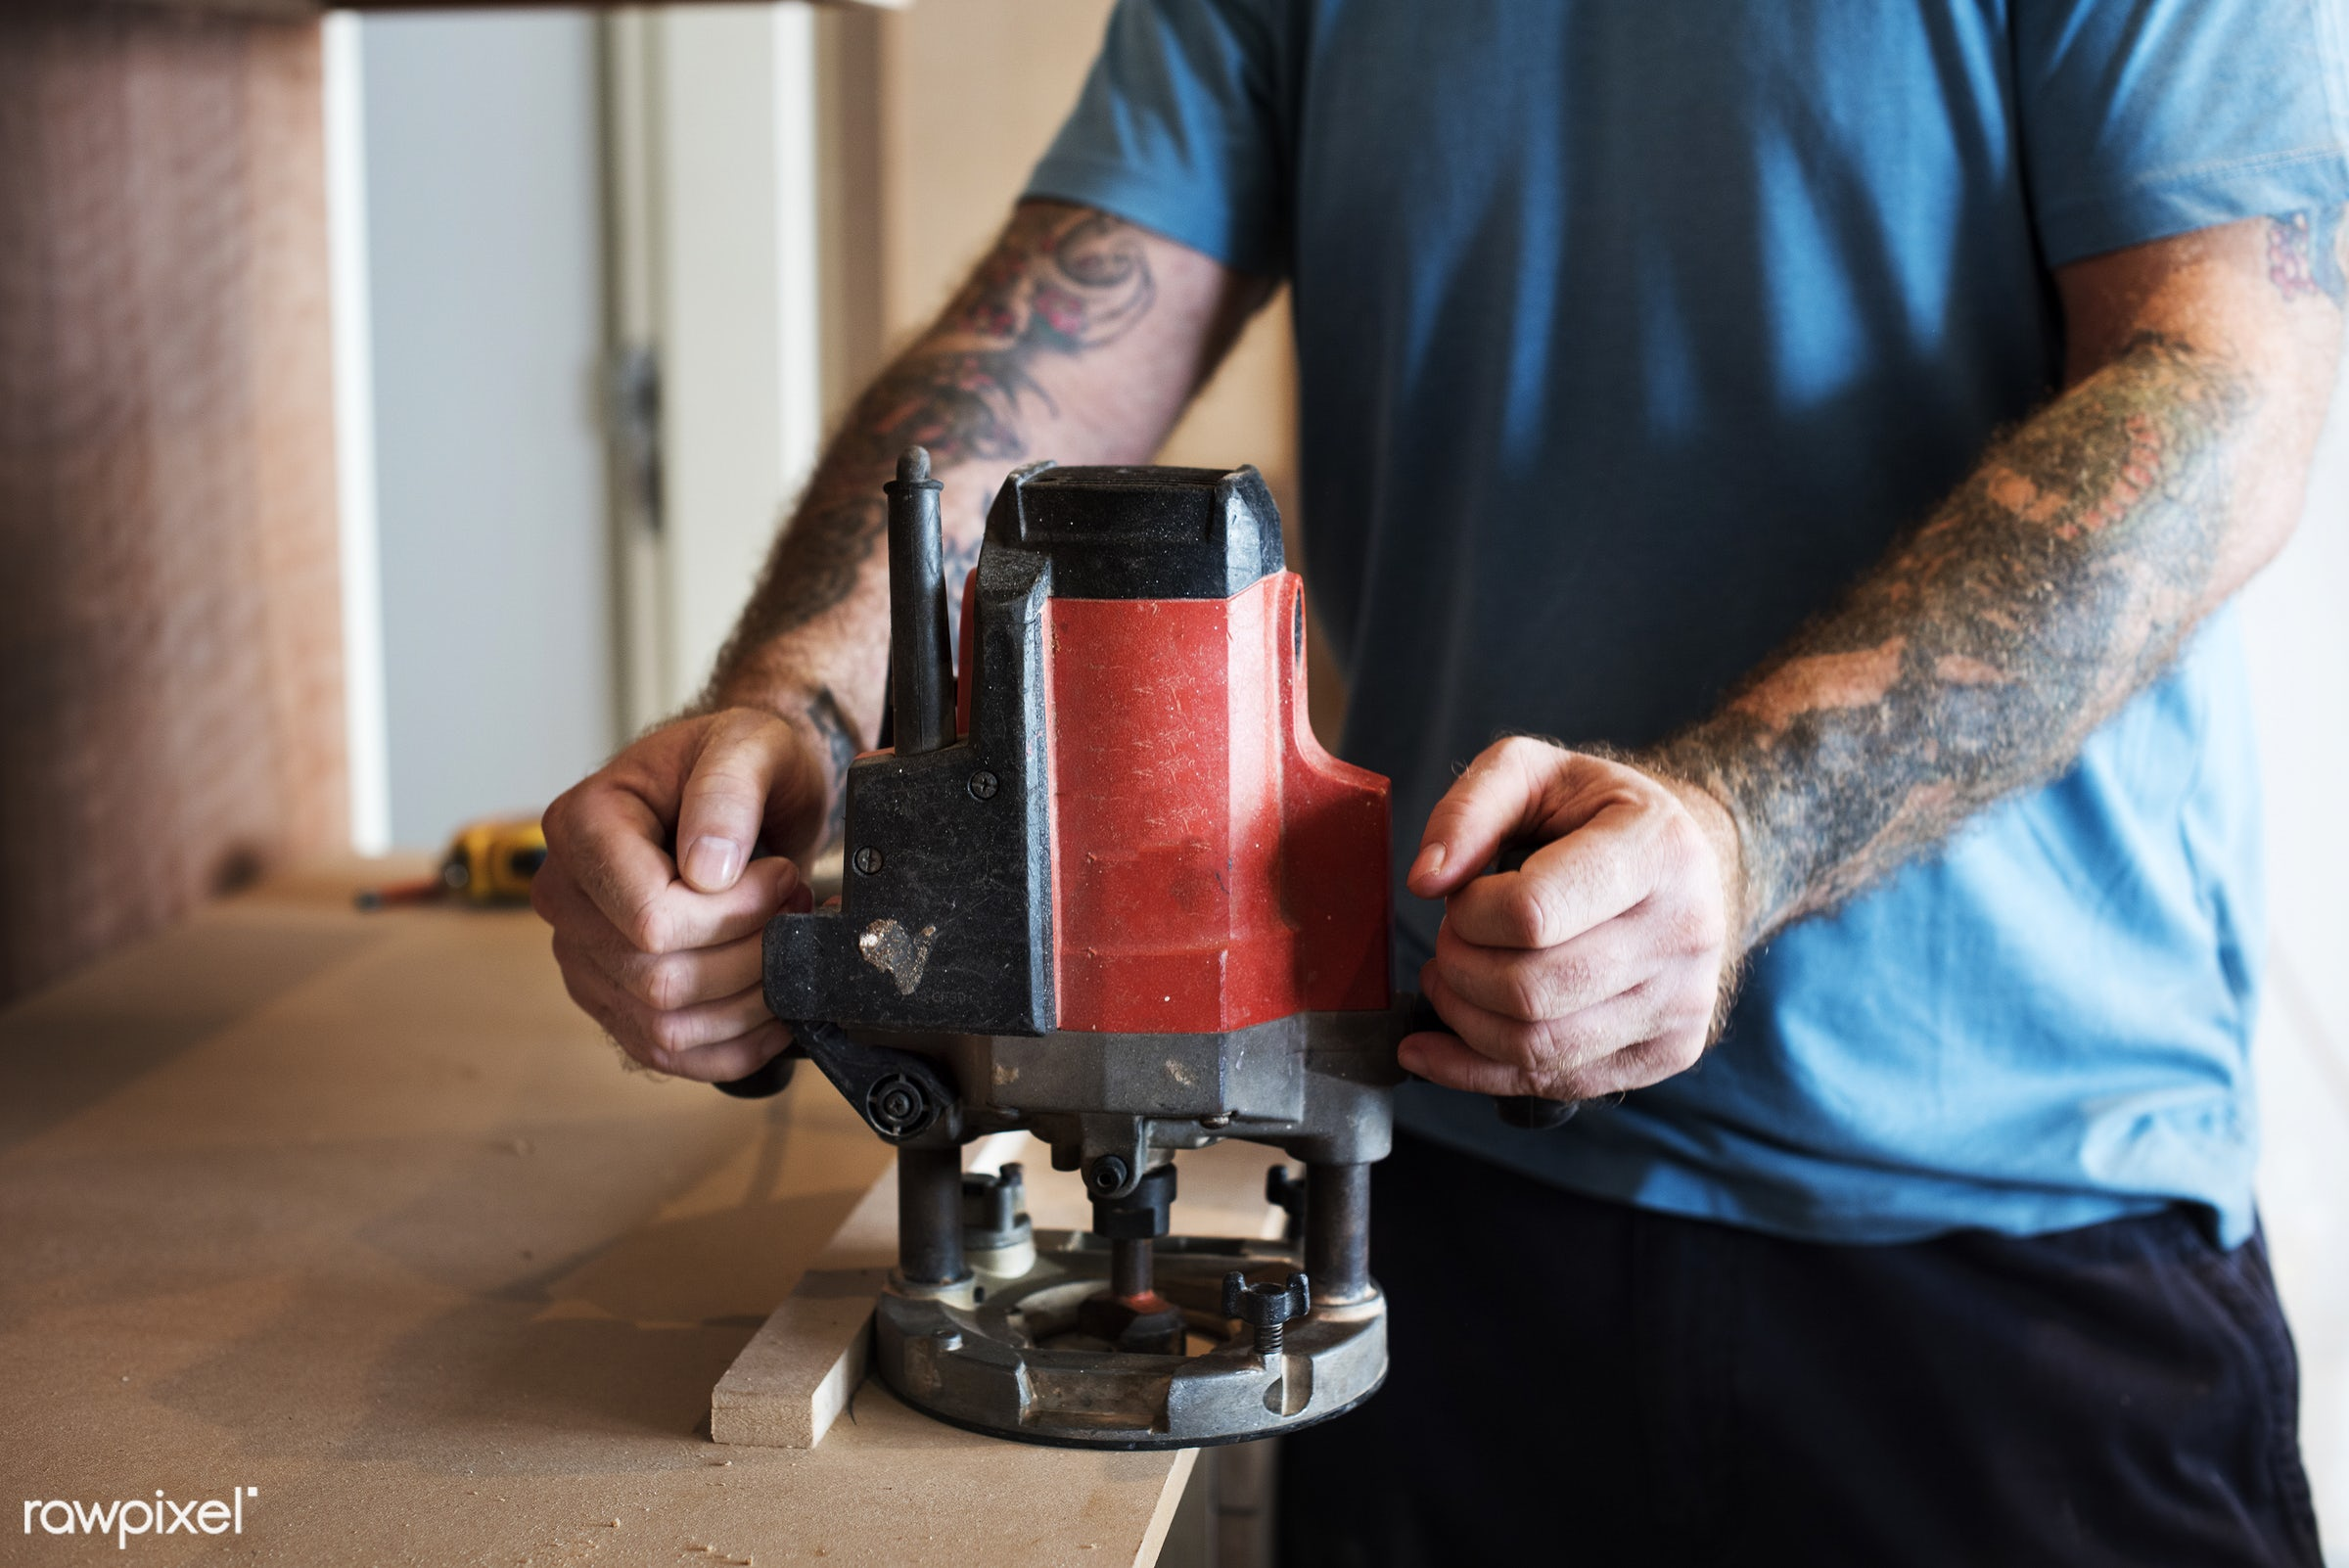 home, technician, development, tool, equipment, house, joiner, engineering, installation, repairman, carpenter, craftsman,...